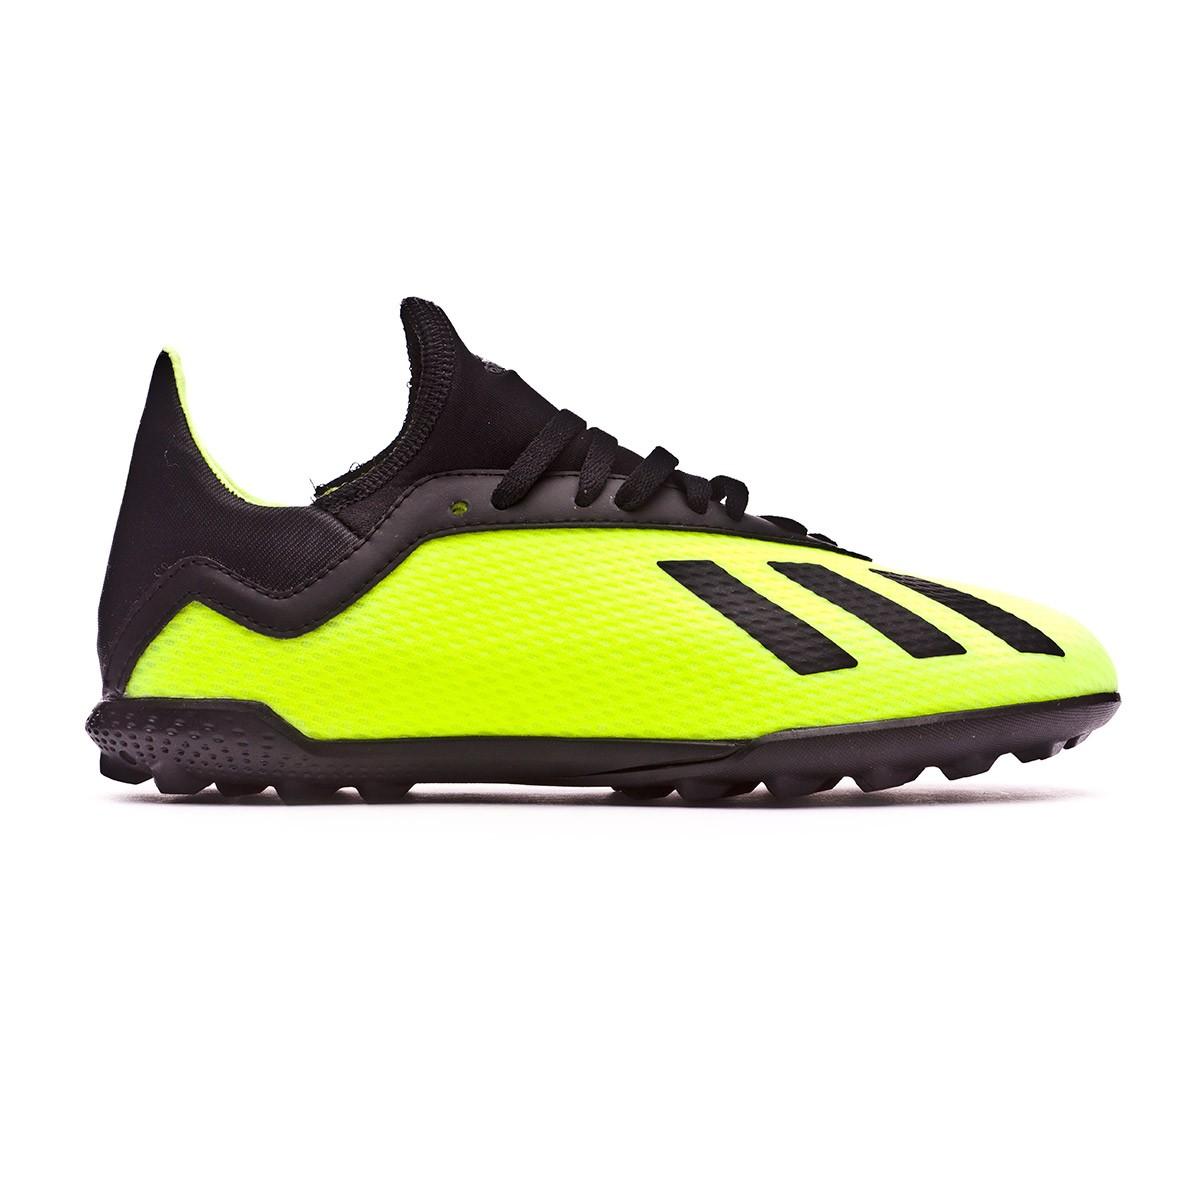 160f54abf51 Football Boot adidas Kids X Tango 18.3 Turf Solar yellow-Core black-Solar  yellow - Tienda de fútbol Fútbol Emotion